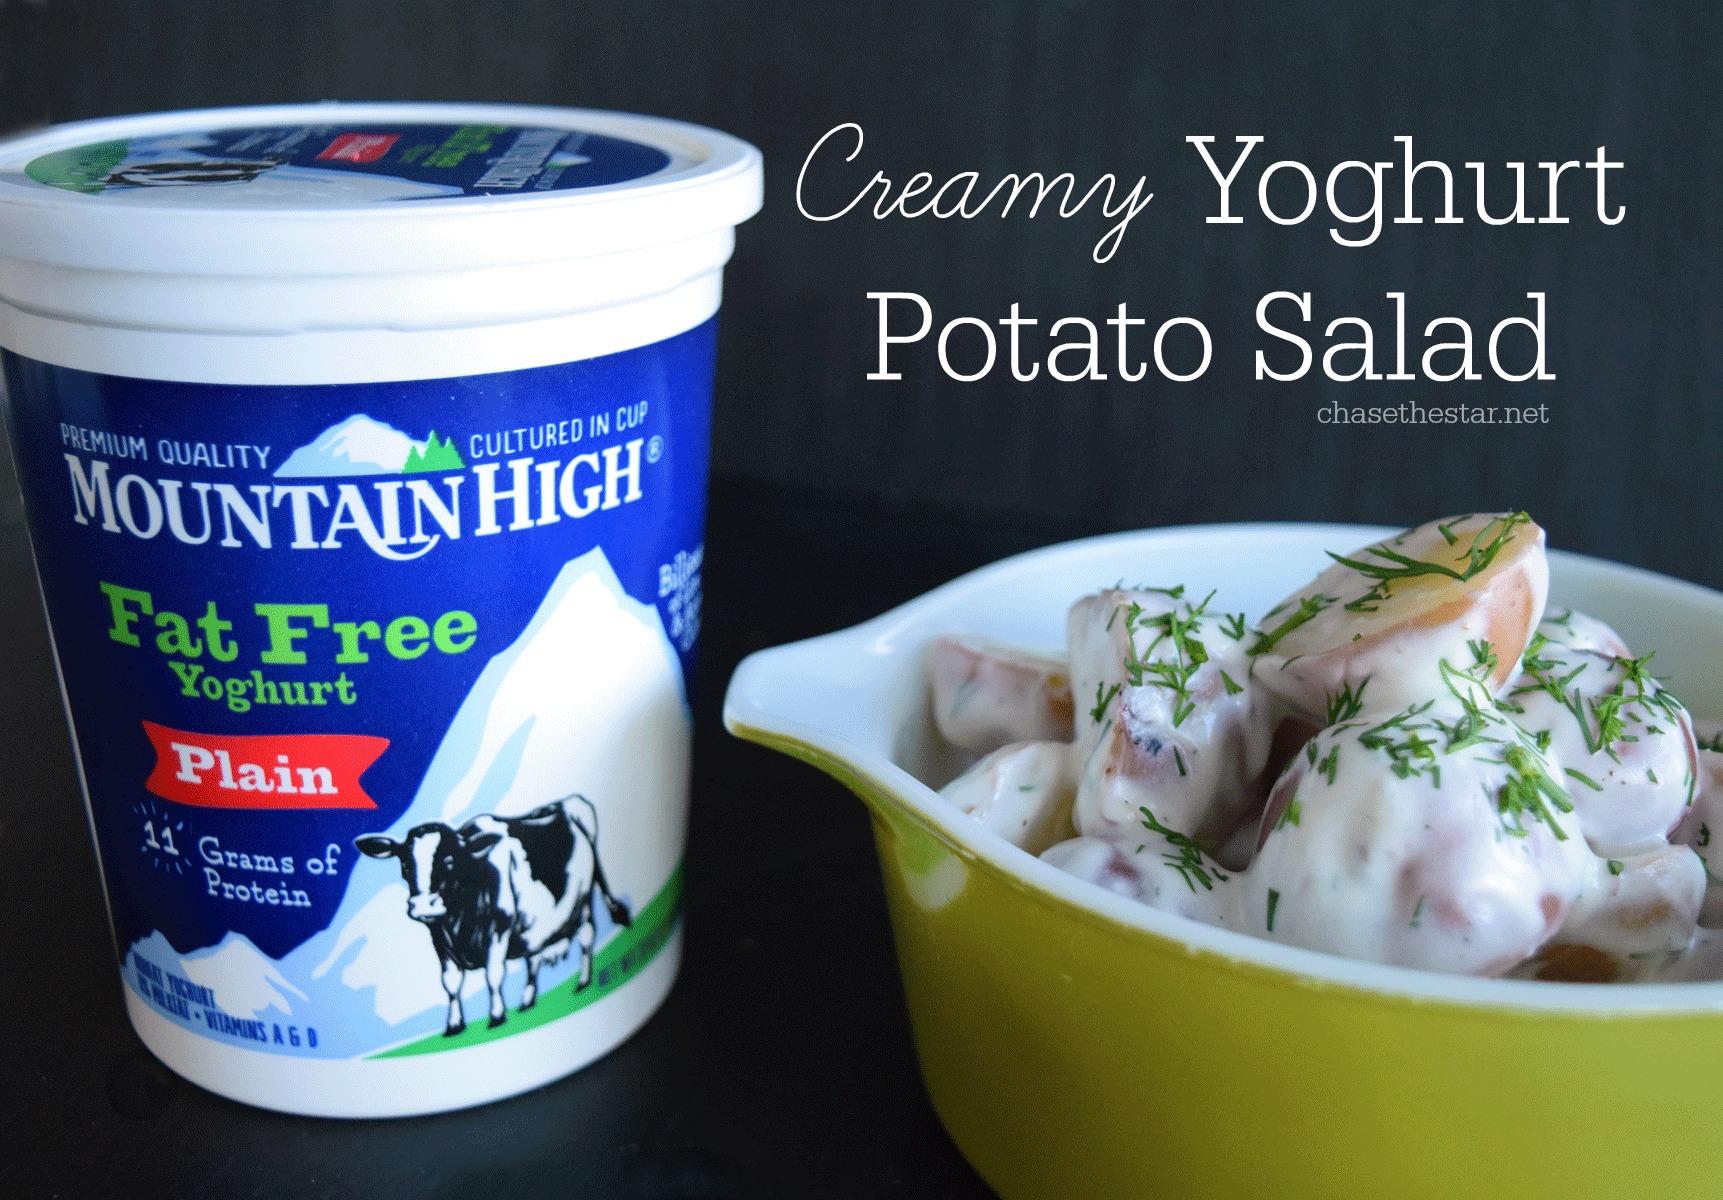 Healthier Choice Creamy Yoghurt Potato Salad httpsooh.lia26c12b